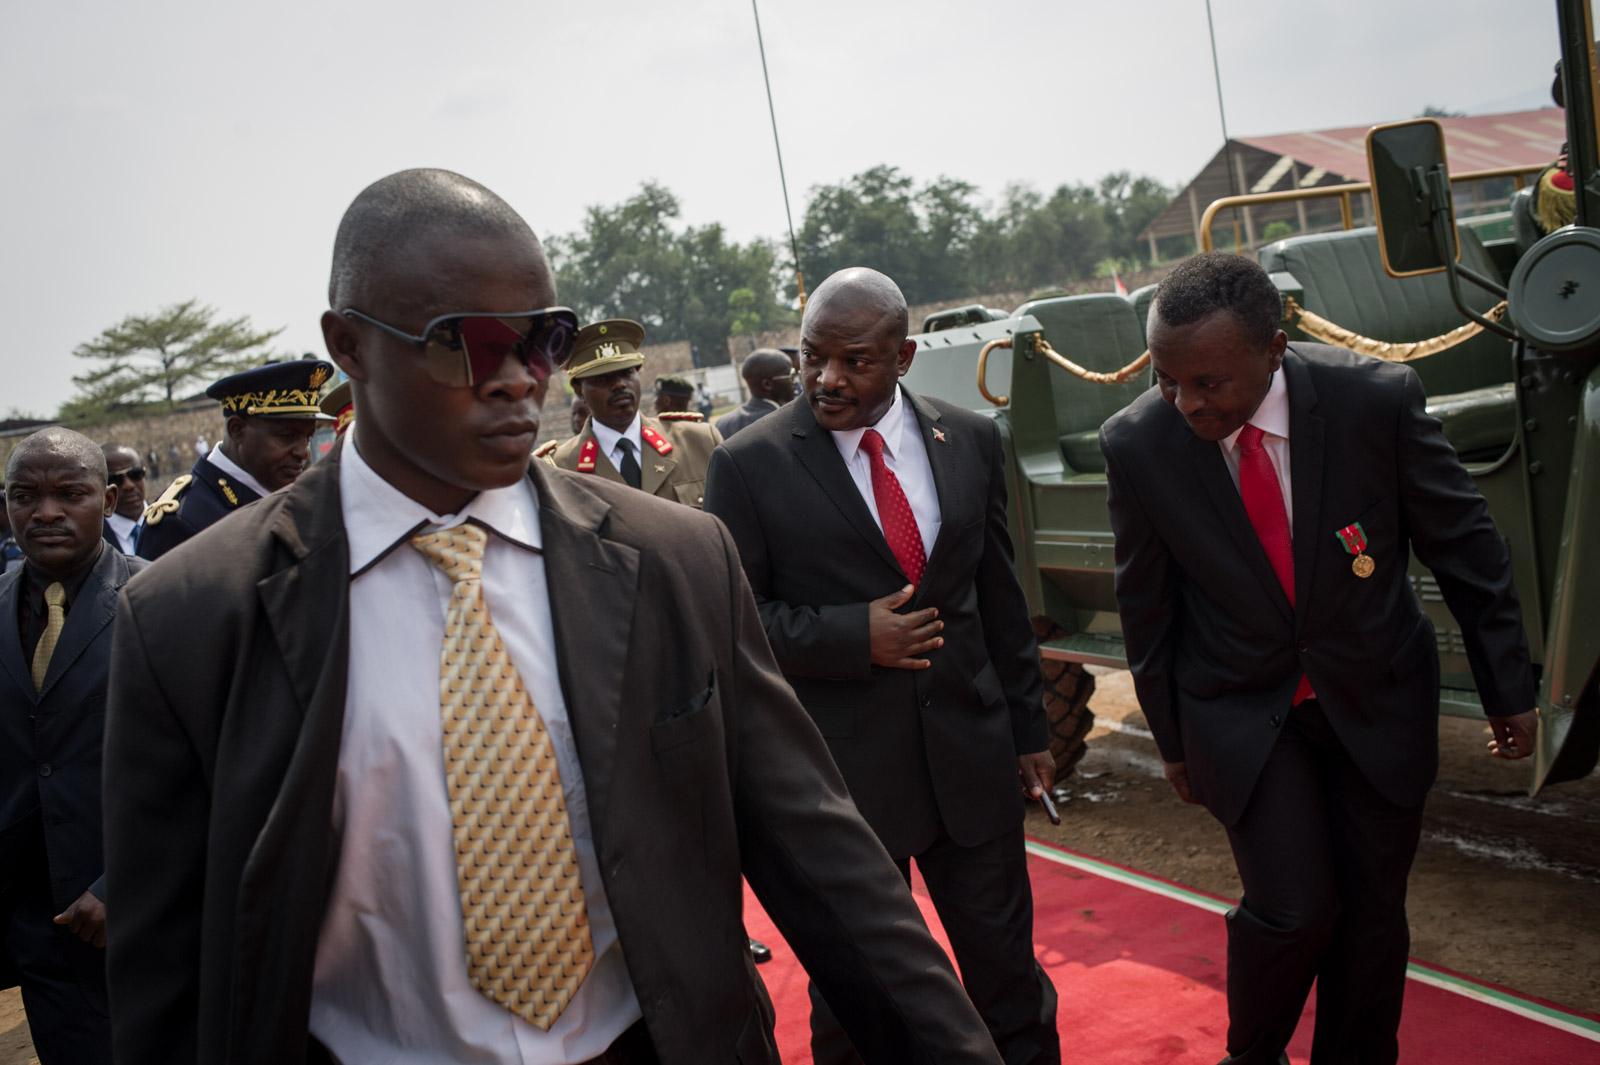 36_PEM_BDI_Burundi_7206.jpg